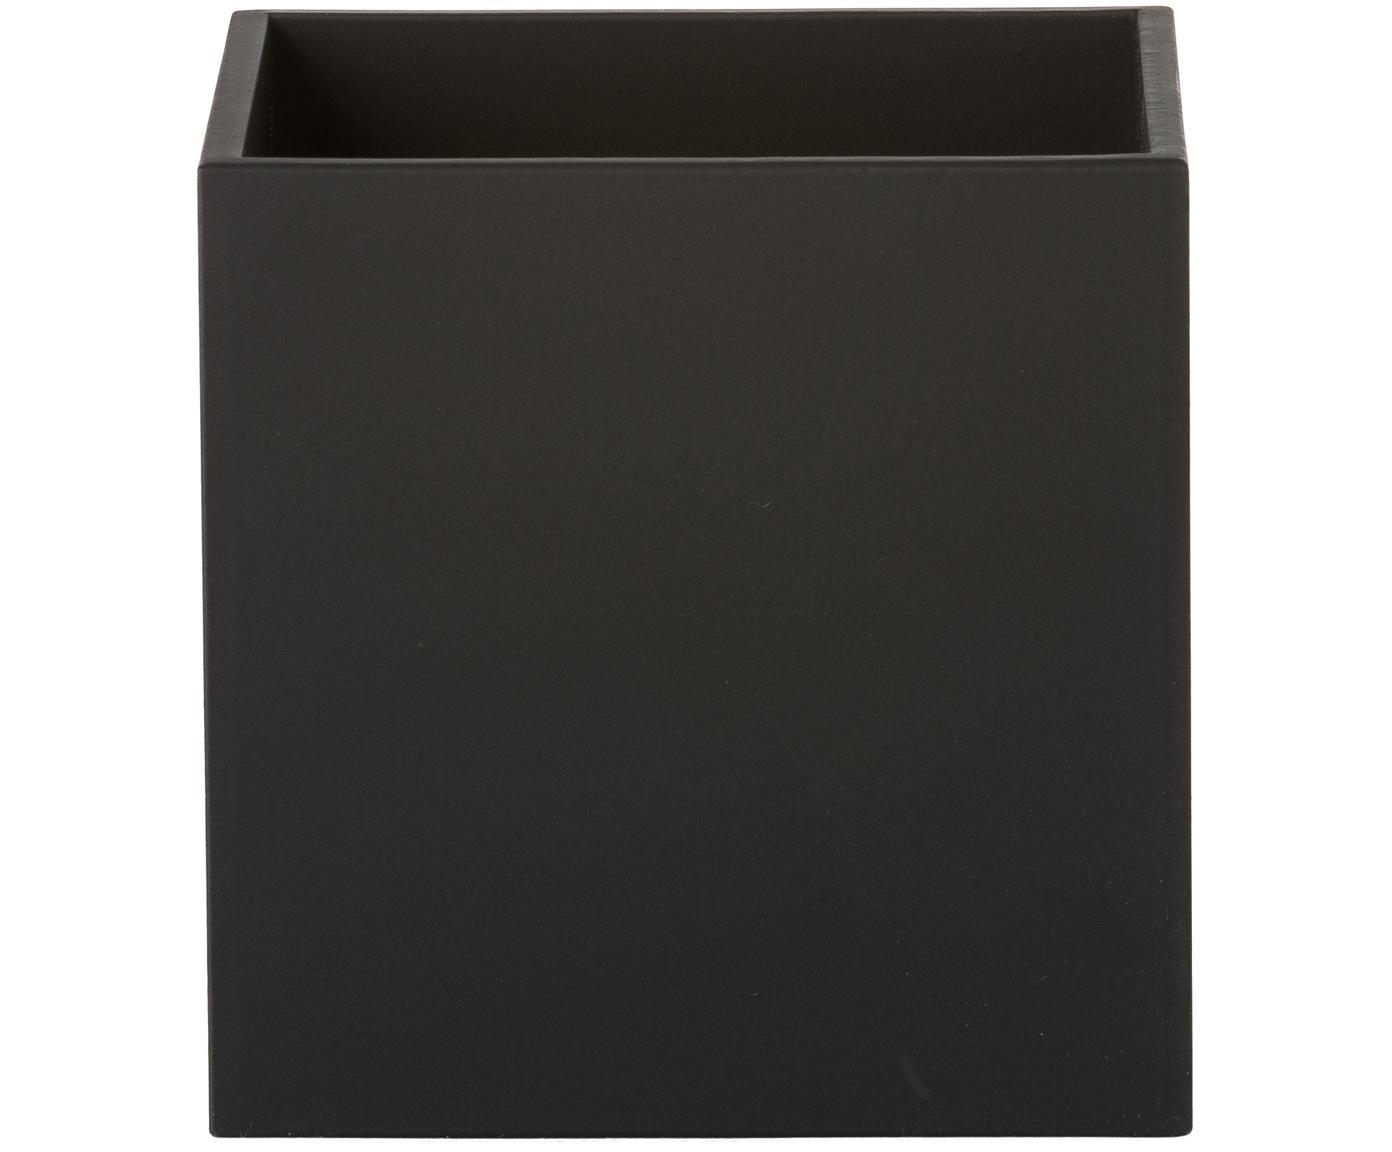 Applique Quad, Alluminio verniciato a polvere, Nero, Larg. 10 x Alt. 10 cm